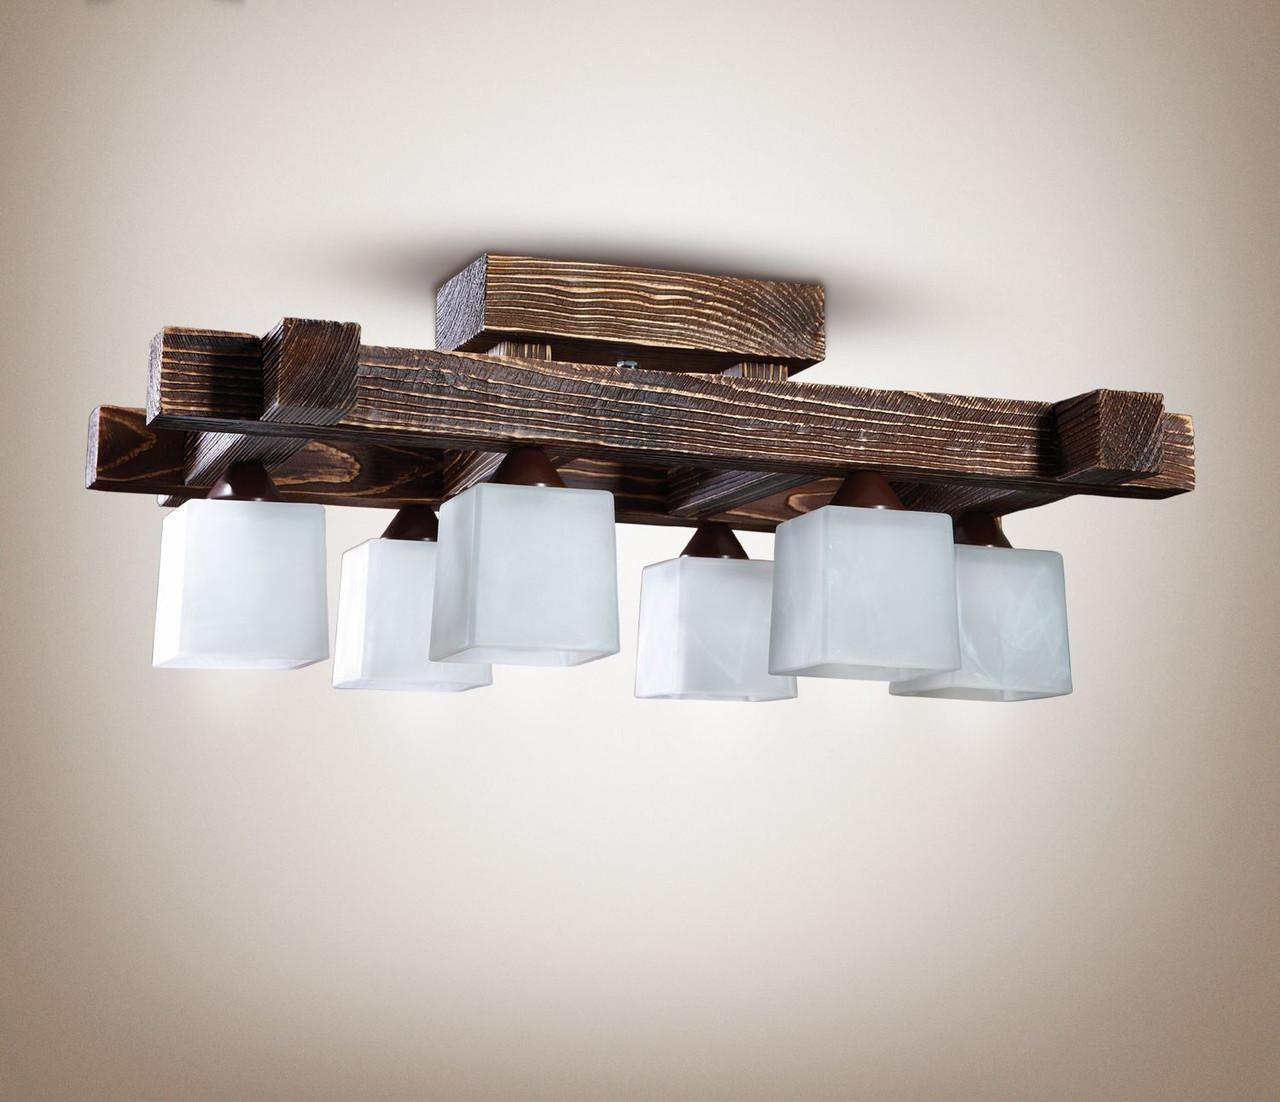 Люстра дерев'яна стельова у велику кімнату 4360-2